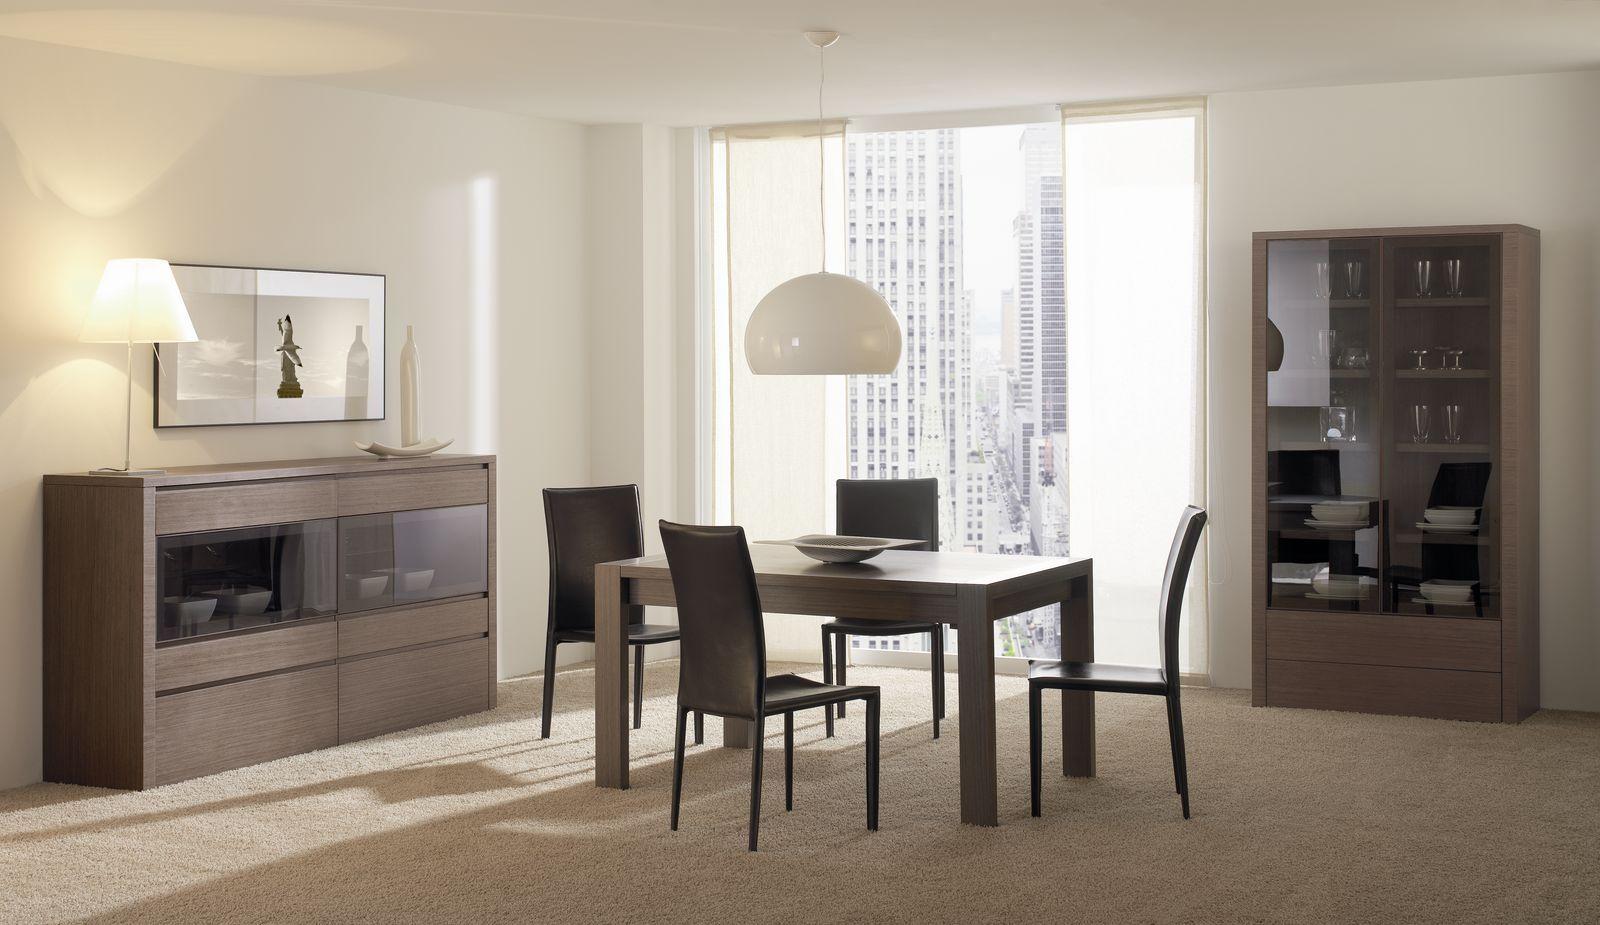 Sof s sillones y muebles para living comedor zoffa for Diseno living comedor